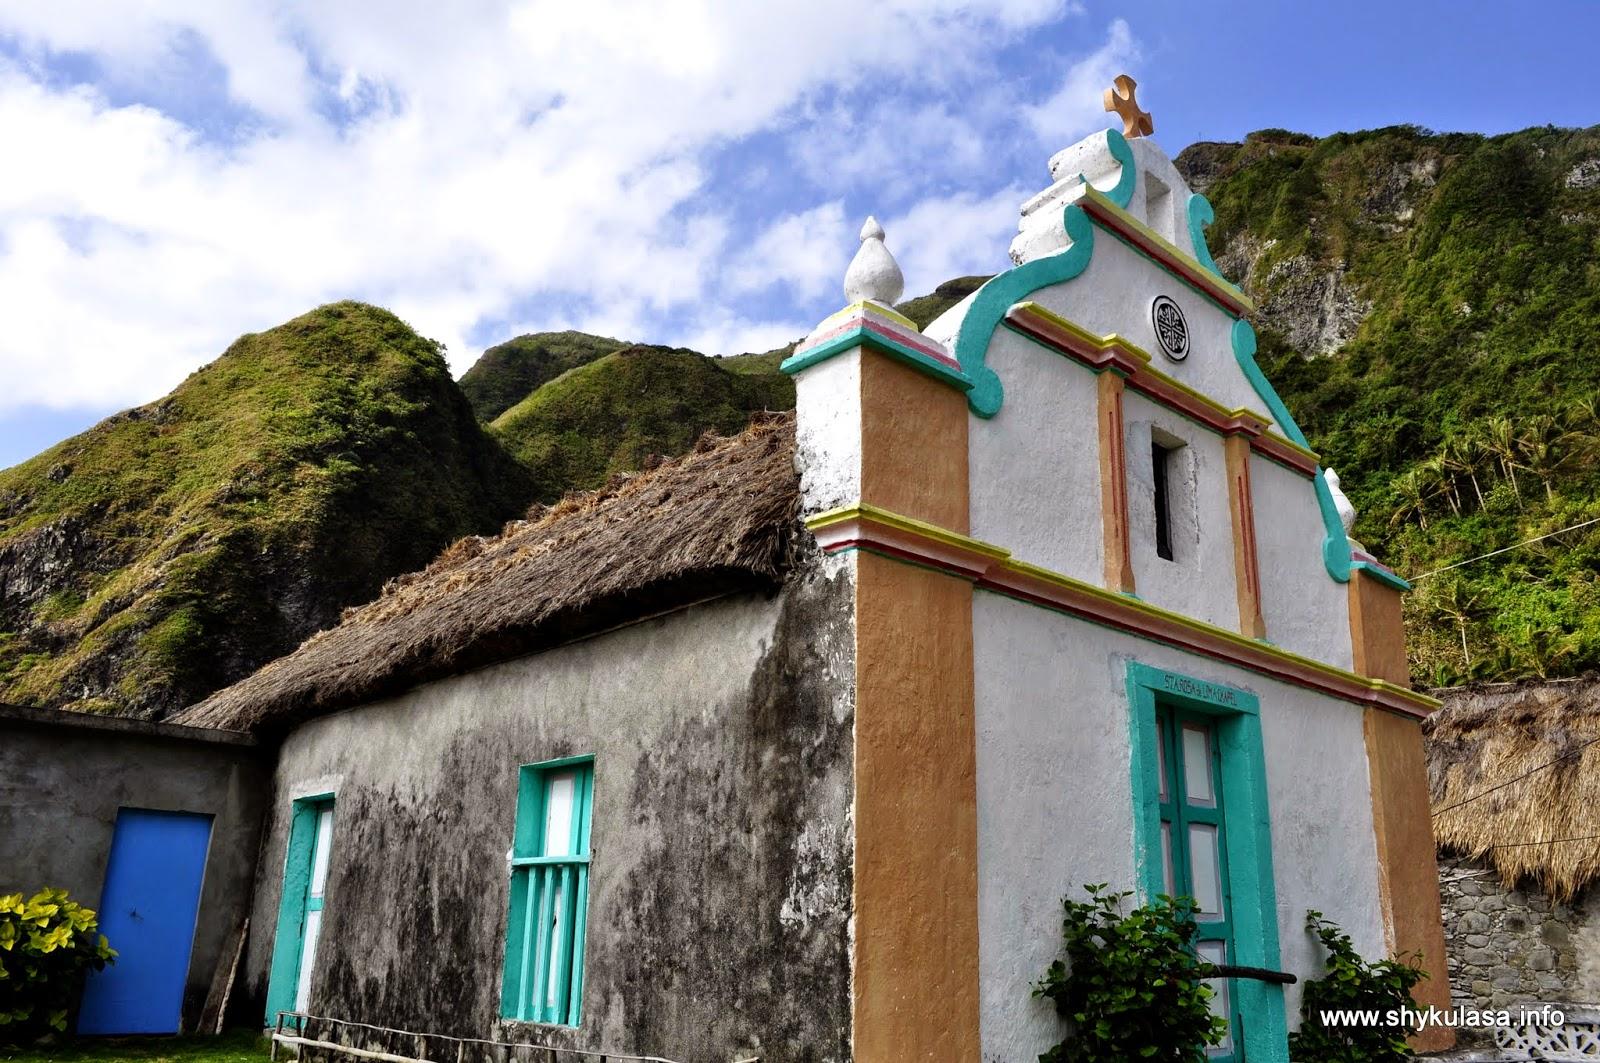 Chavayan Village CHURCH, SABTANG, BATANES